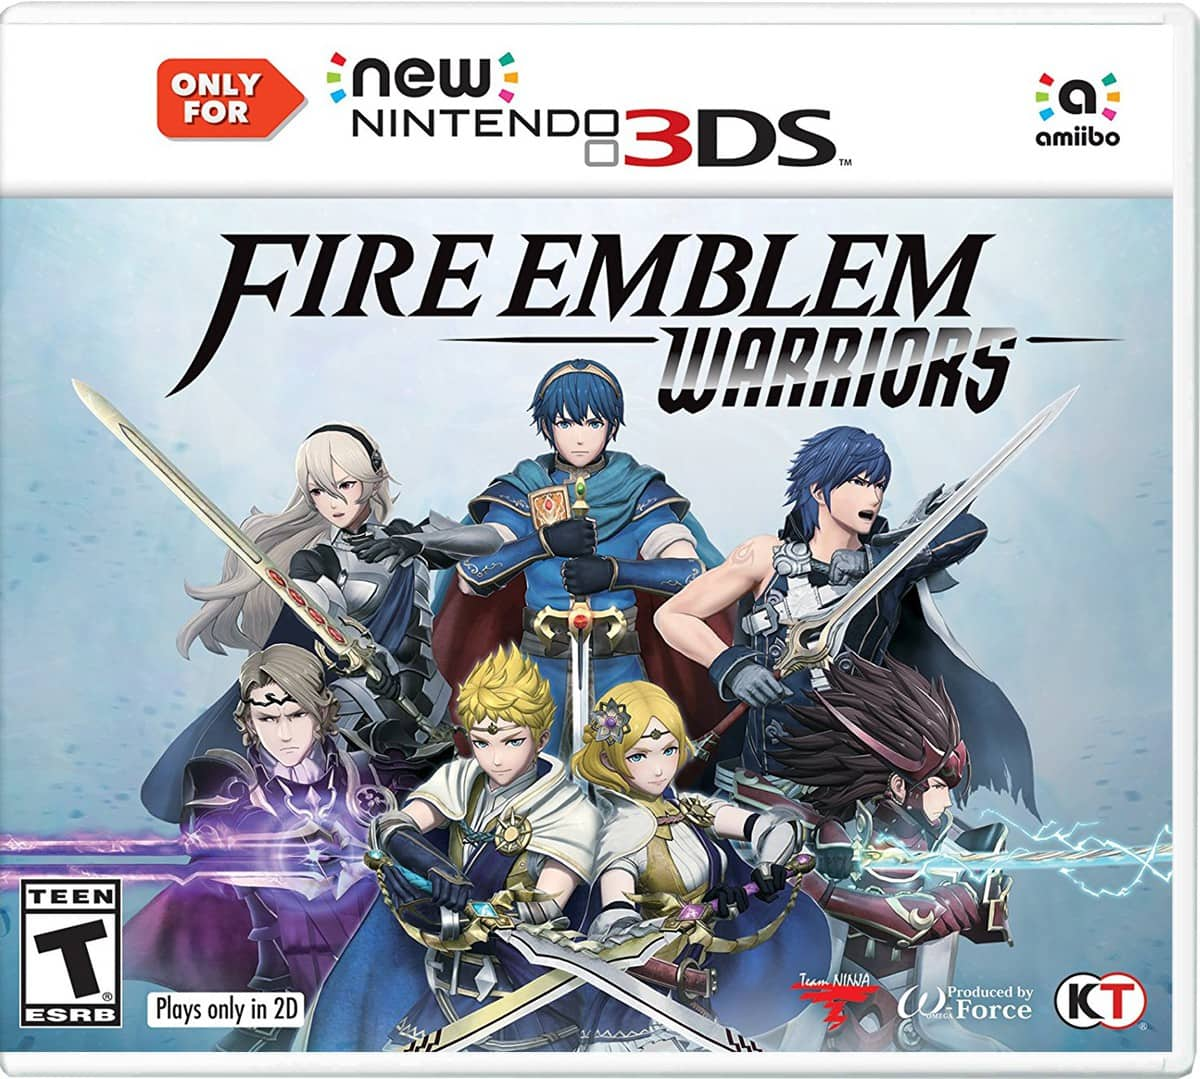 Amazon: Fire Emblem Warriors - New Nintendo 3DS $24, Walmart: $26